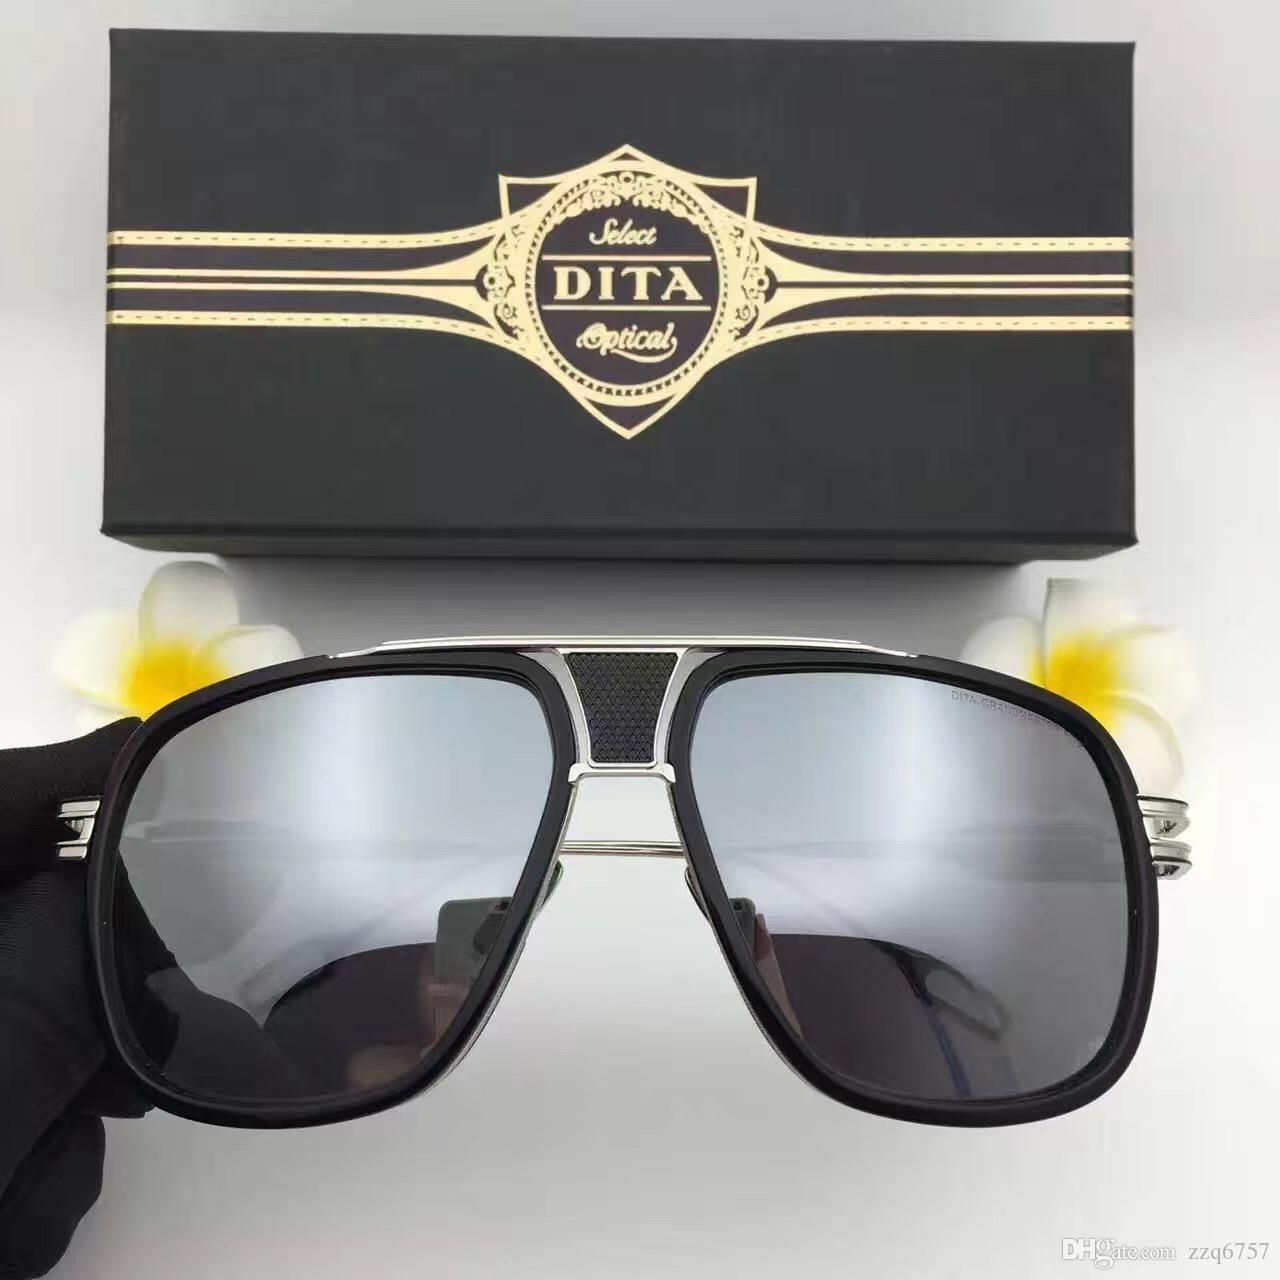 DITA sunglasses dita grandmaster five men brand designer sunglasses retro vintage shiny 18Kgold coating mirror lens big frame original case